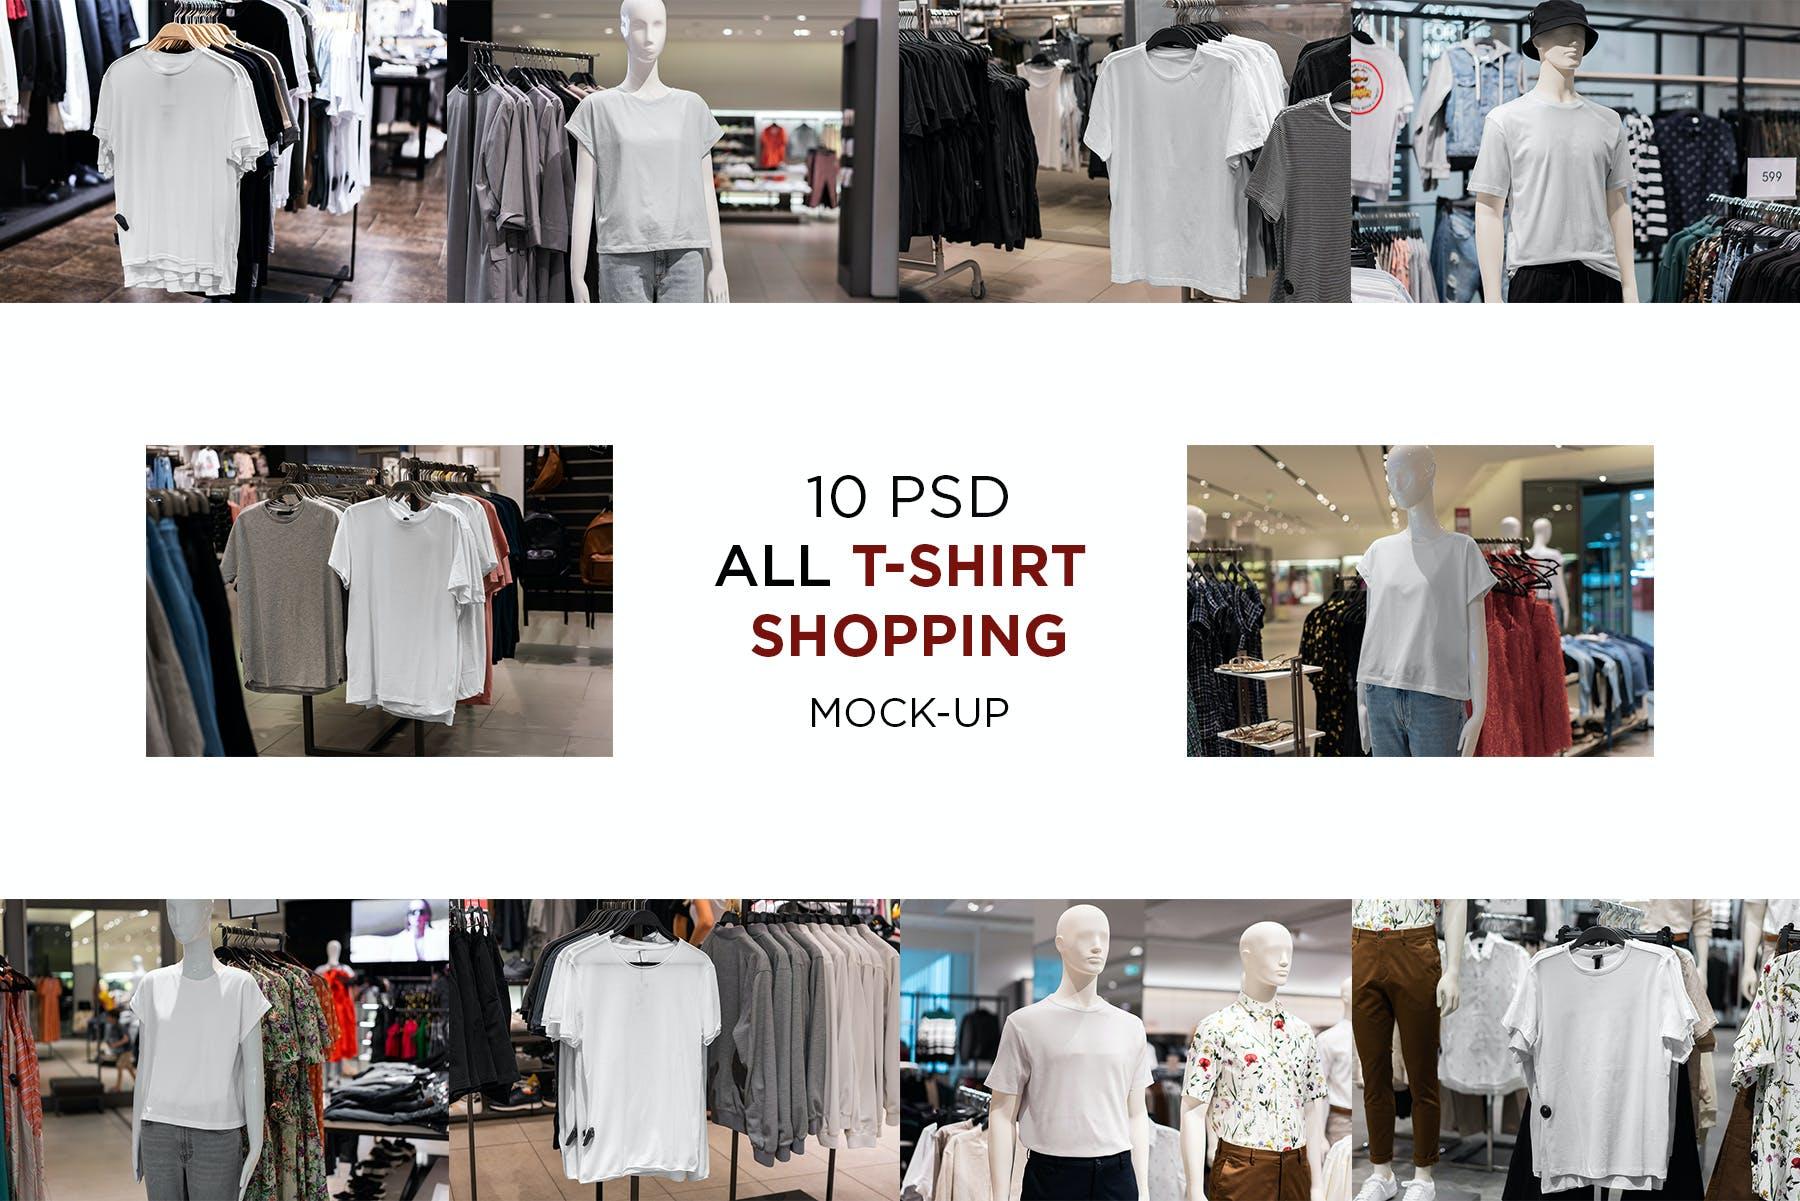 10款T恤半袖衫PSD样机模板 T-Shirt Shopping Mockup Vol.2插图(10)